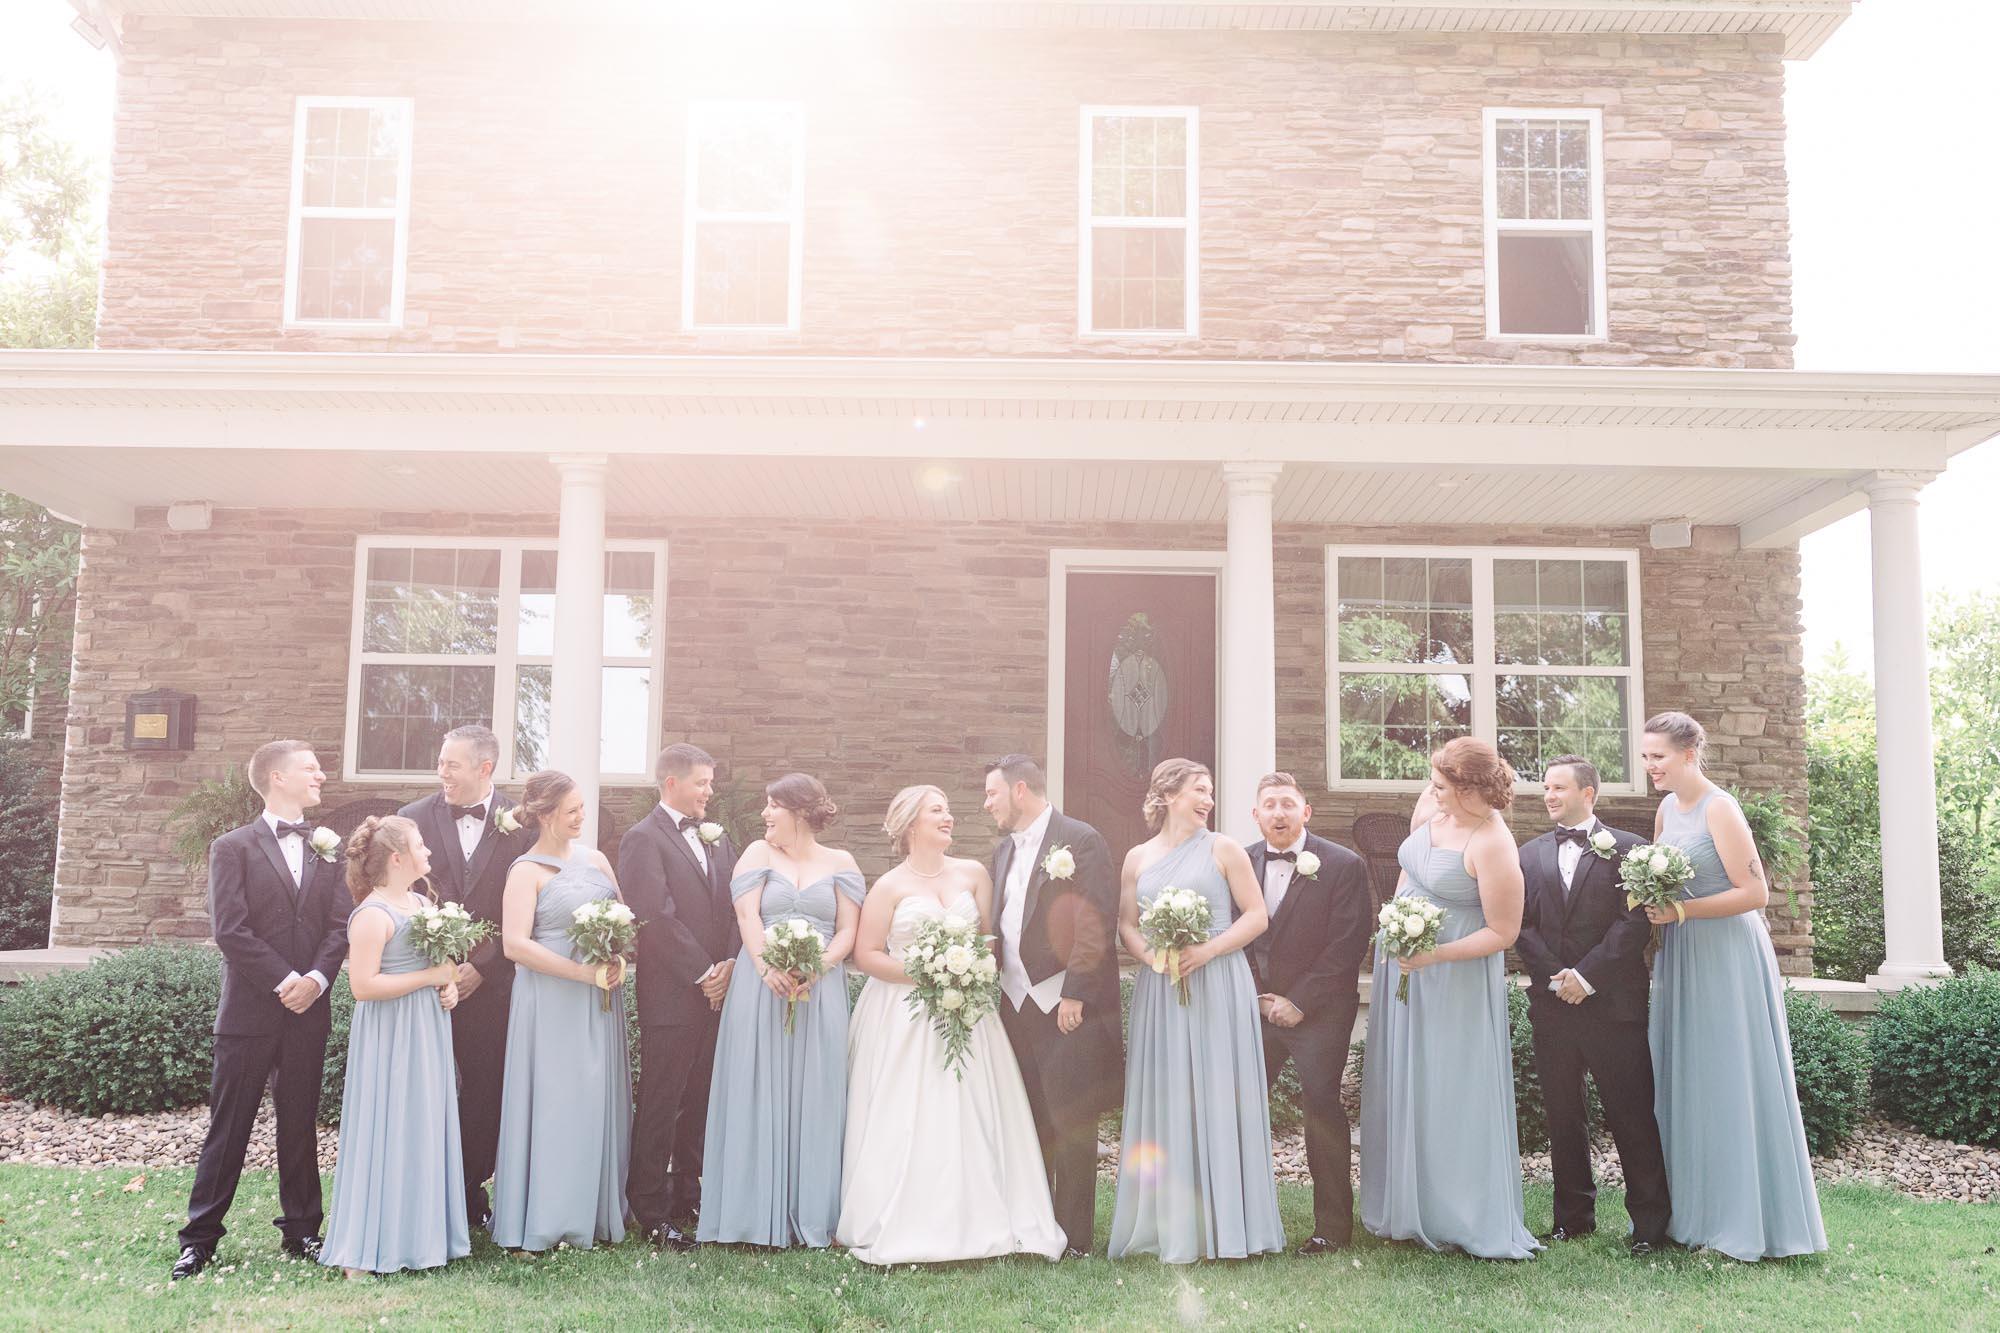 isle-of-que-wedding-6806.jpg